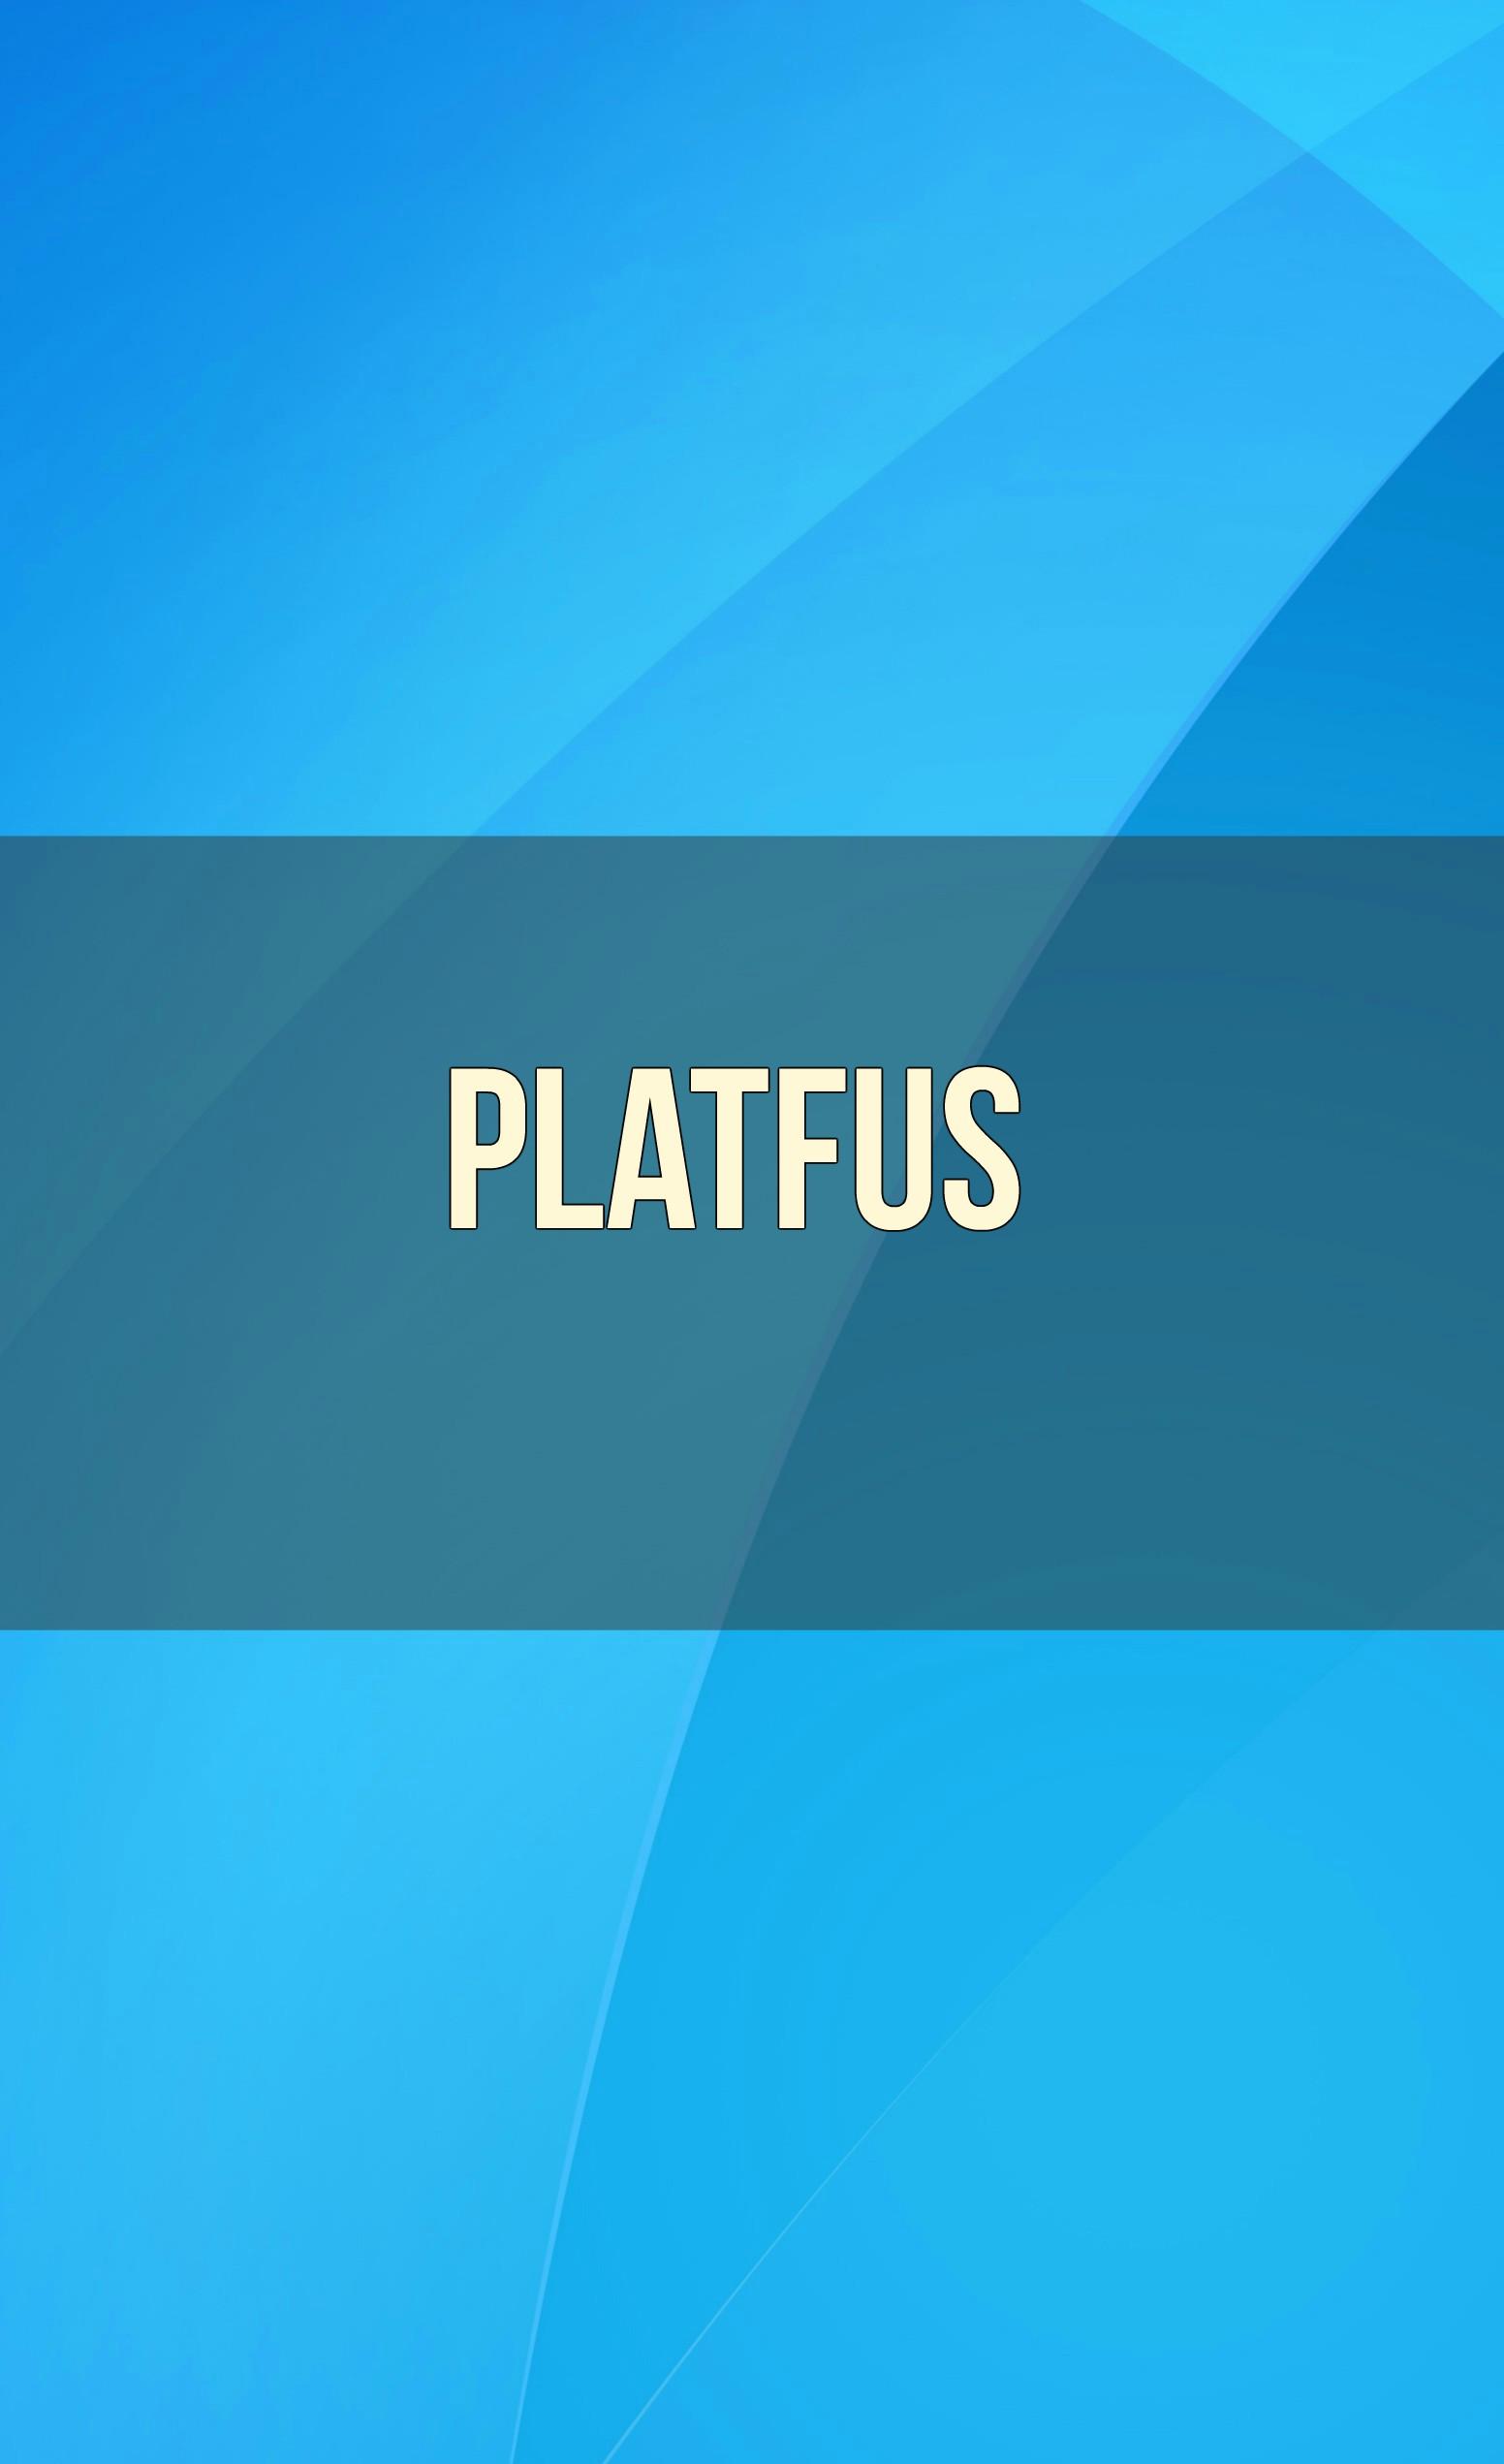 platfus